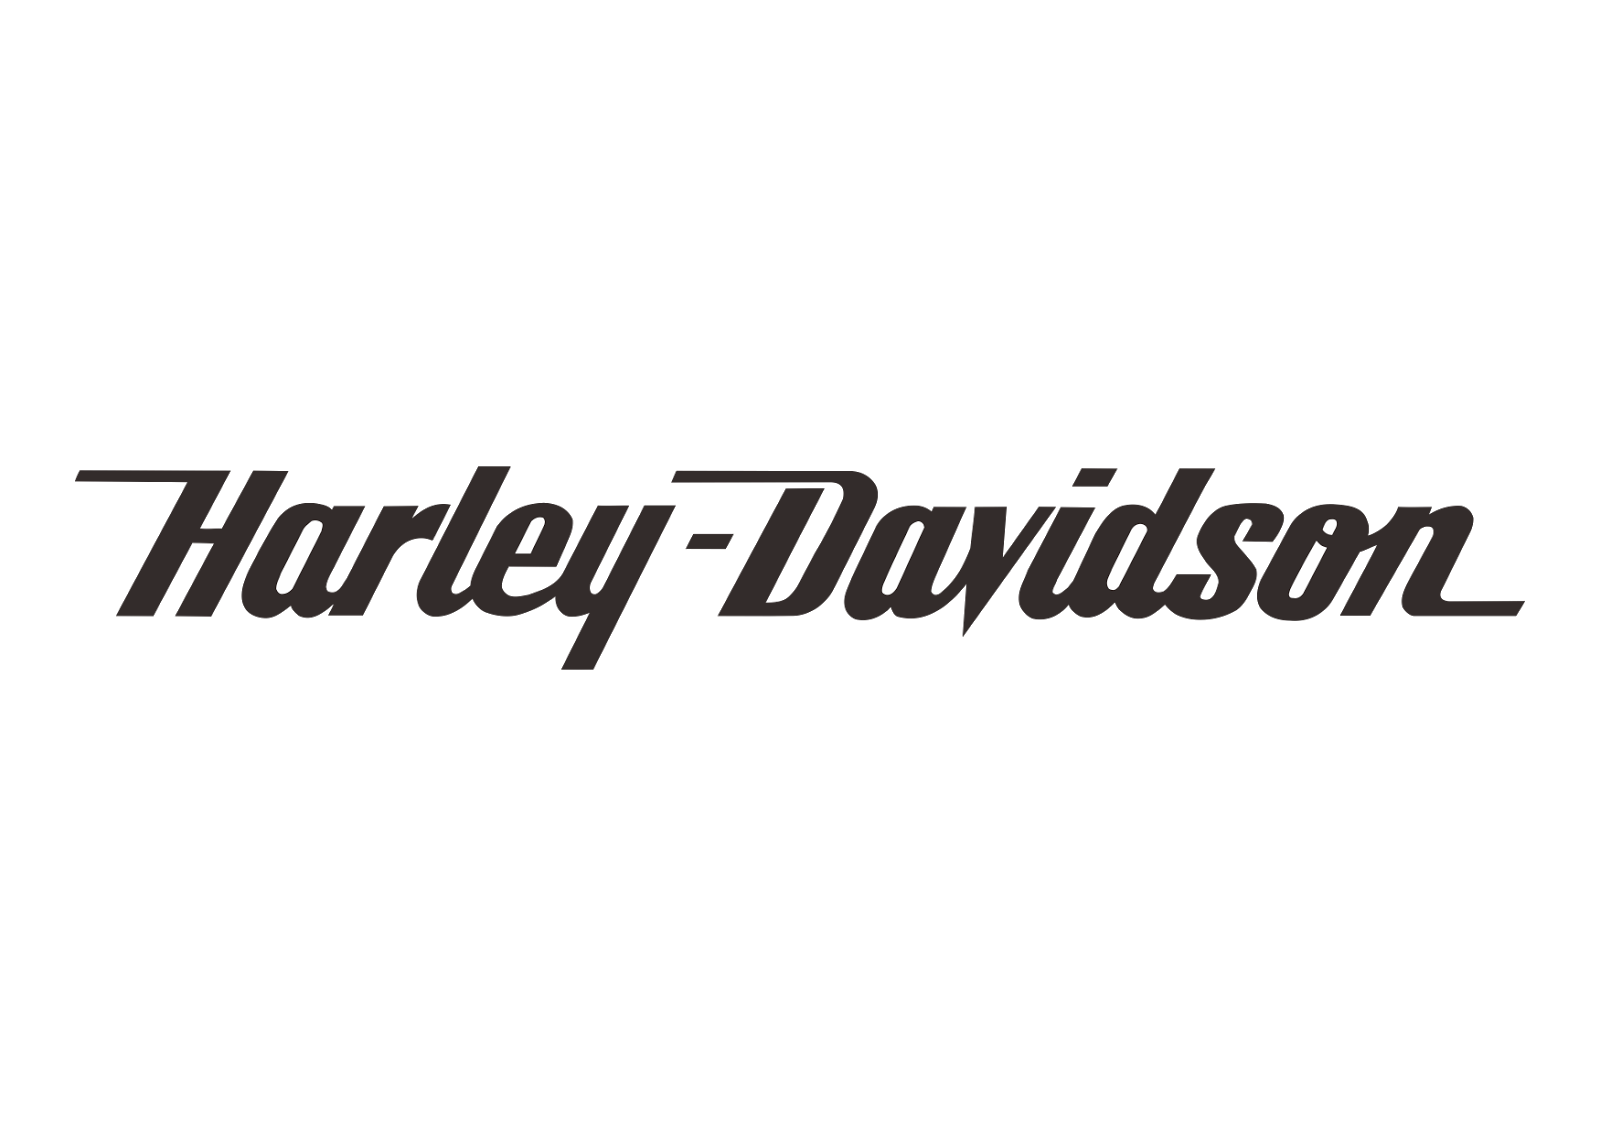 Harley Davidson clipart vector Clip Vector ~ on Free